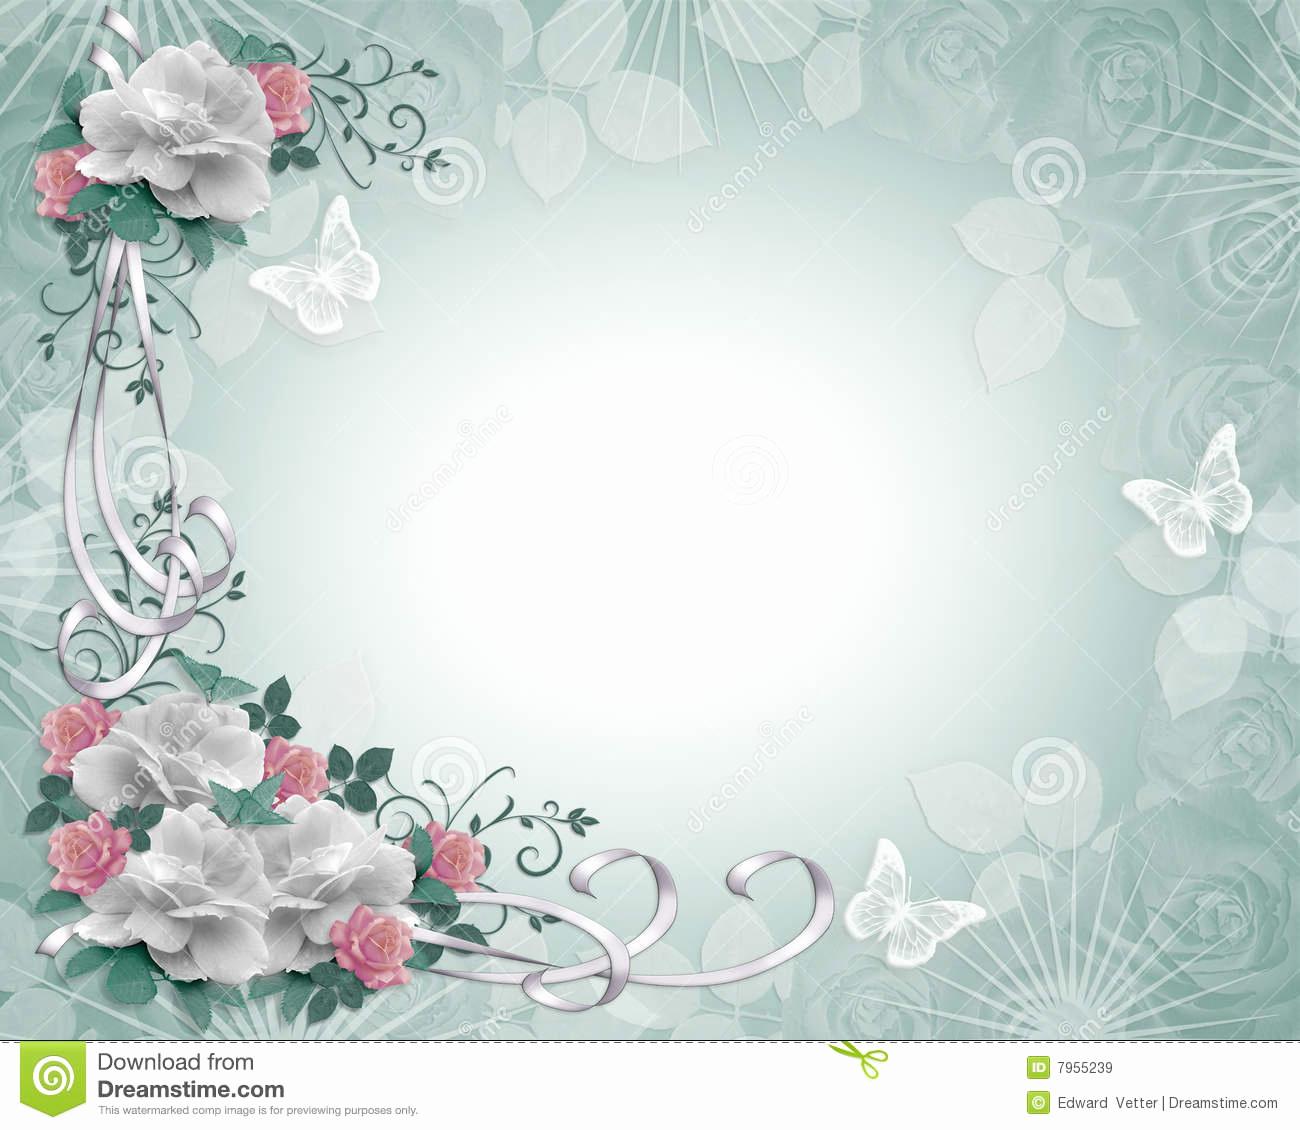 Wedding Invitation Background Designs Elegant Free Invitation Background Designs